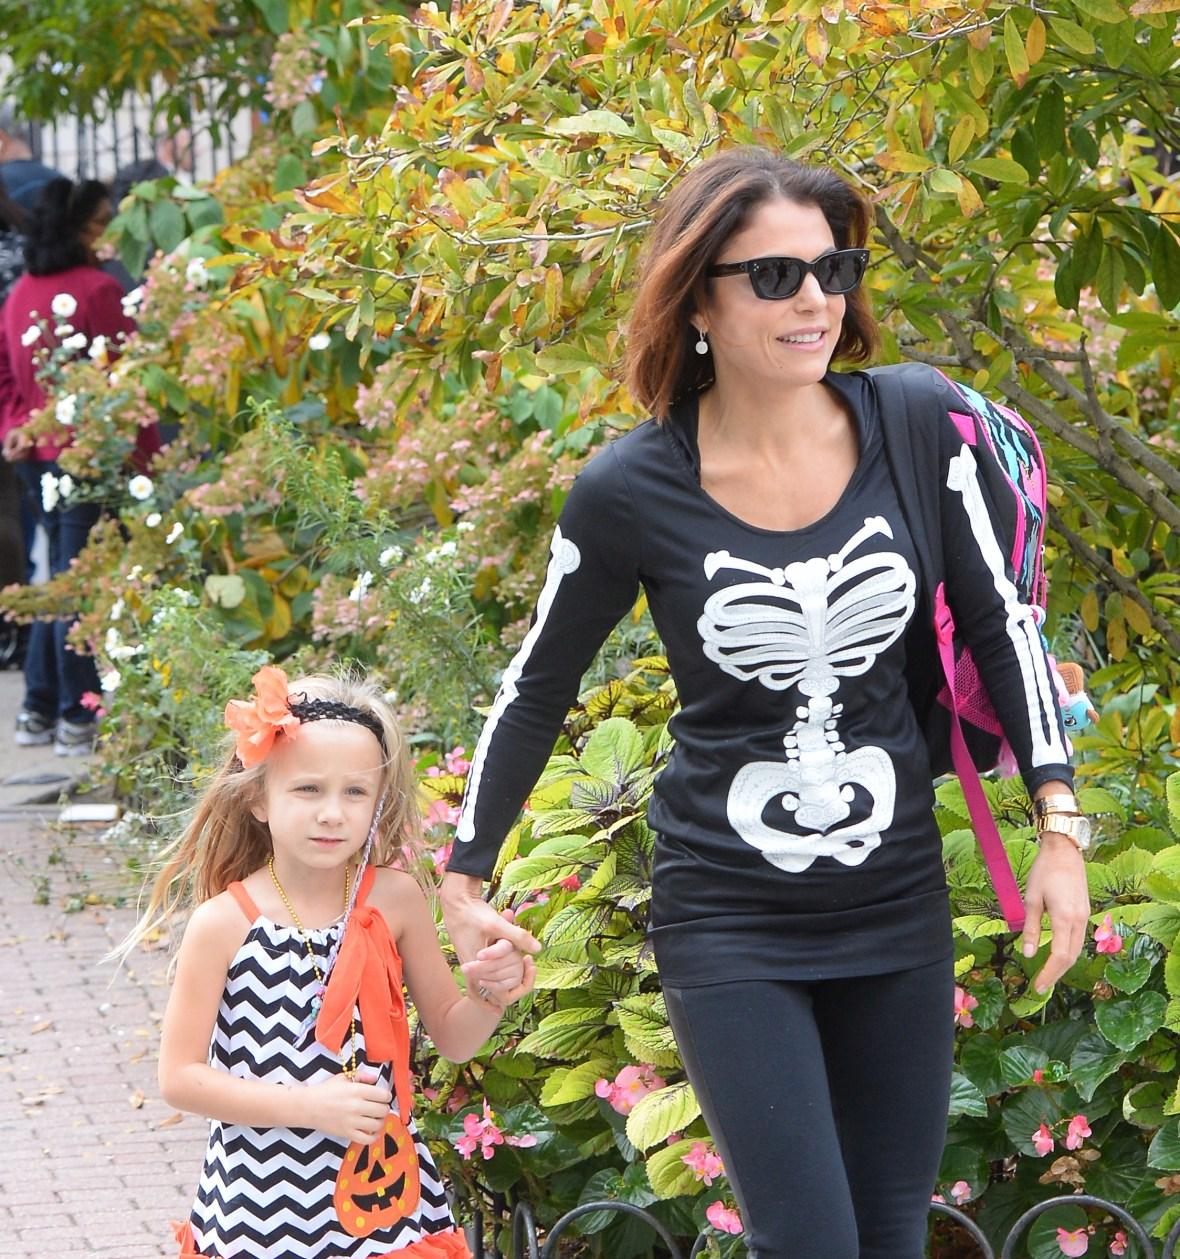 bethenny frankel and daughter bryn hoppy october 2015 getty